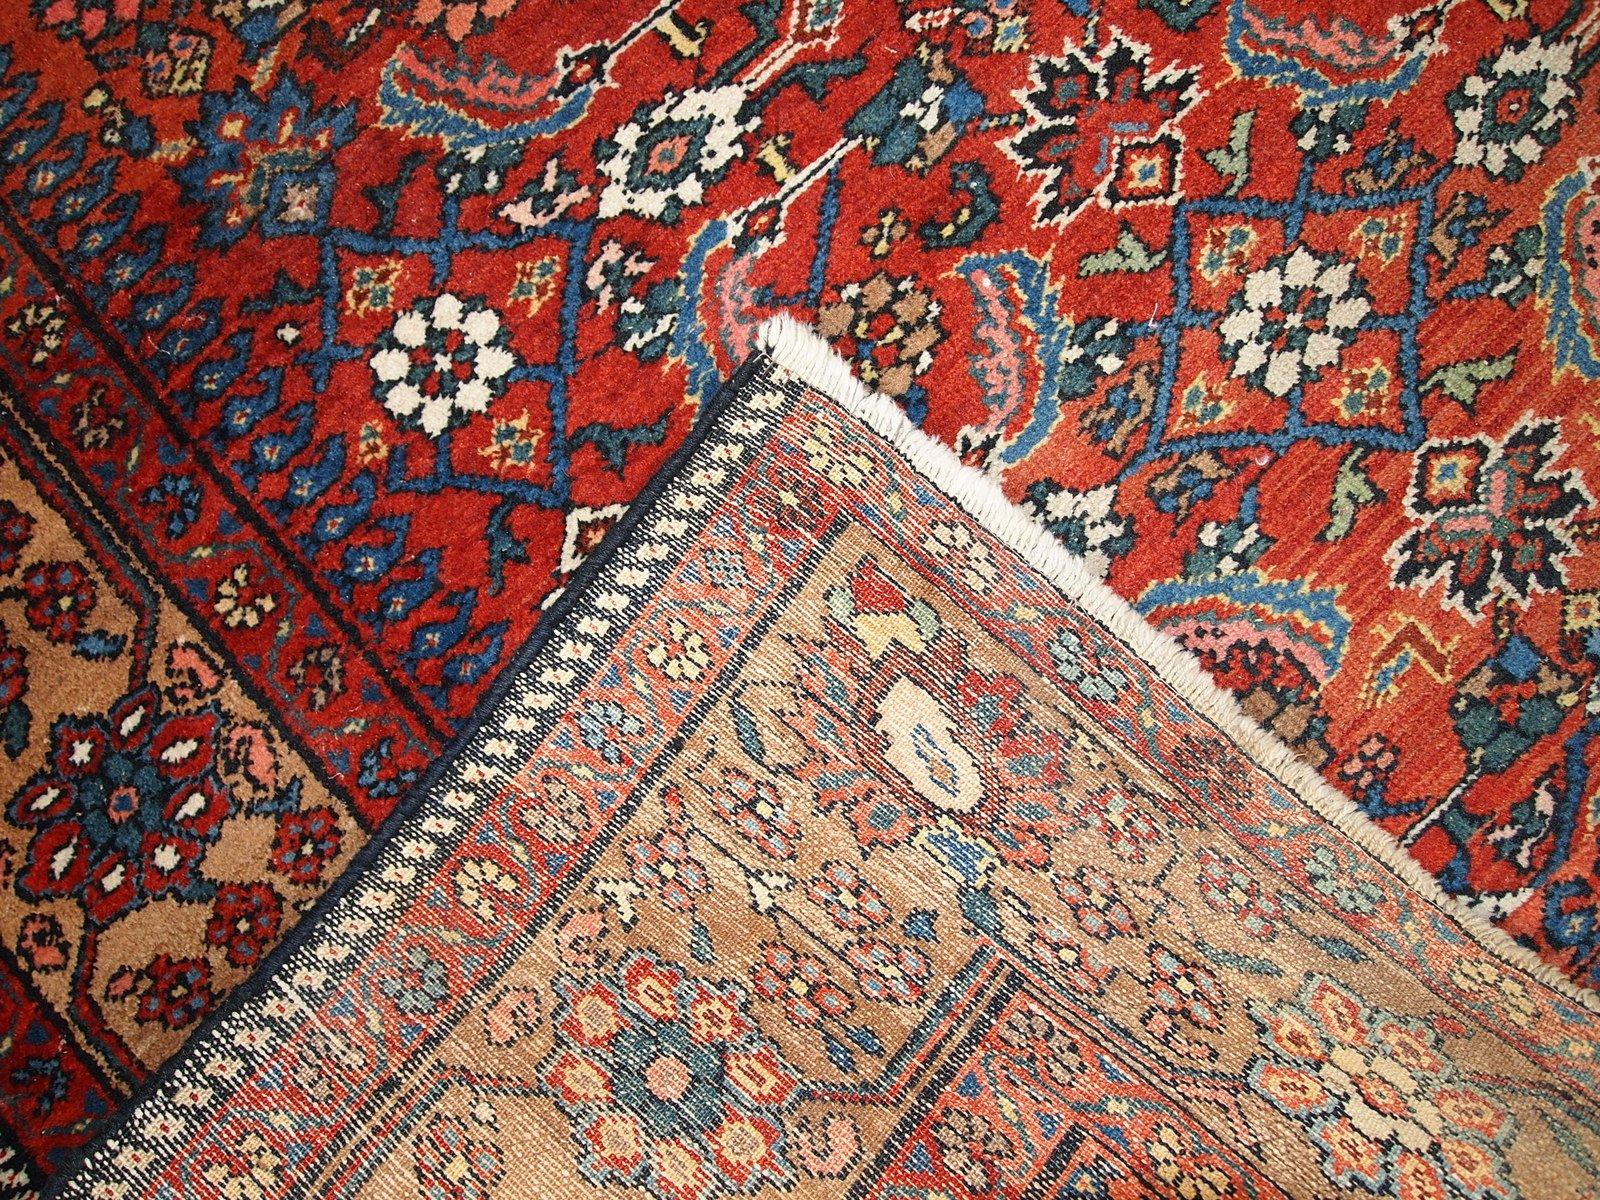 tapis hamadan vintage fait main iran 1920s en vente sur pamono. Black Bedroom Furniture Sets. Home Design Ideas